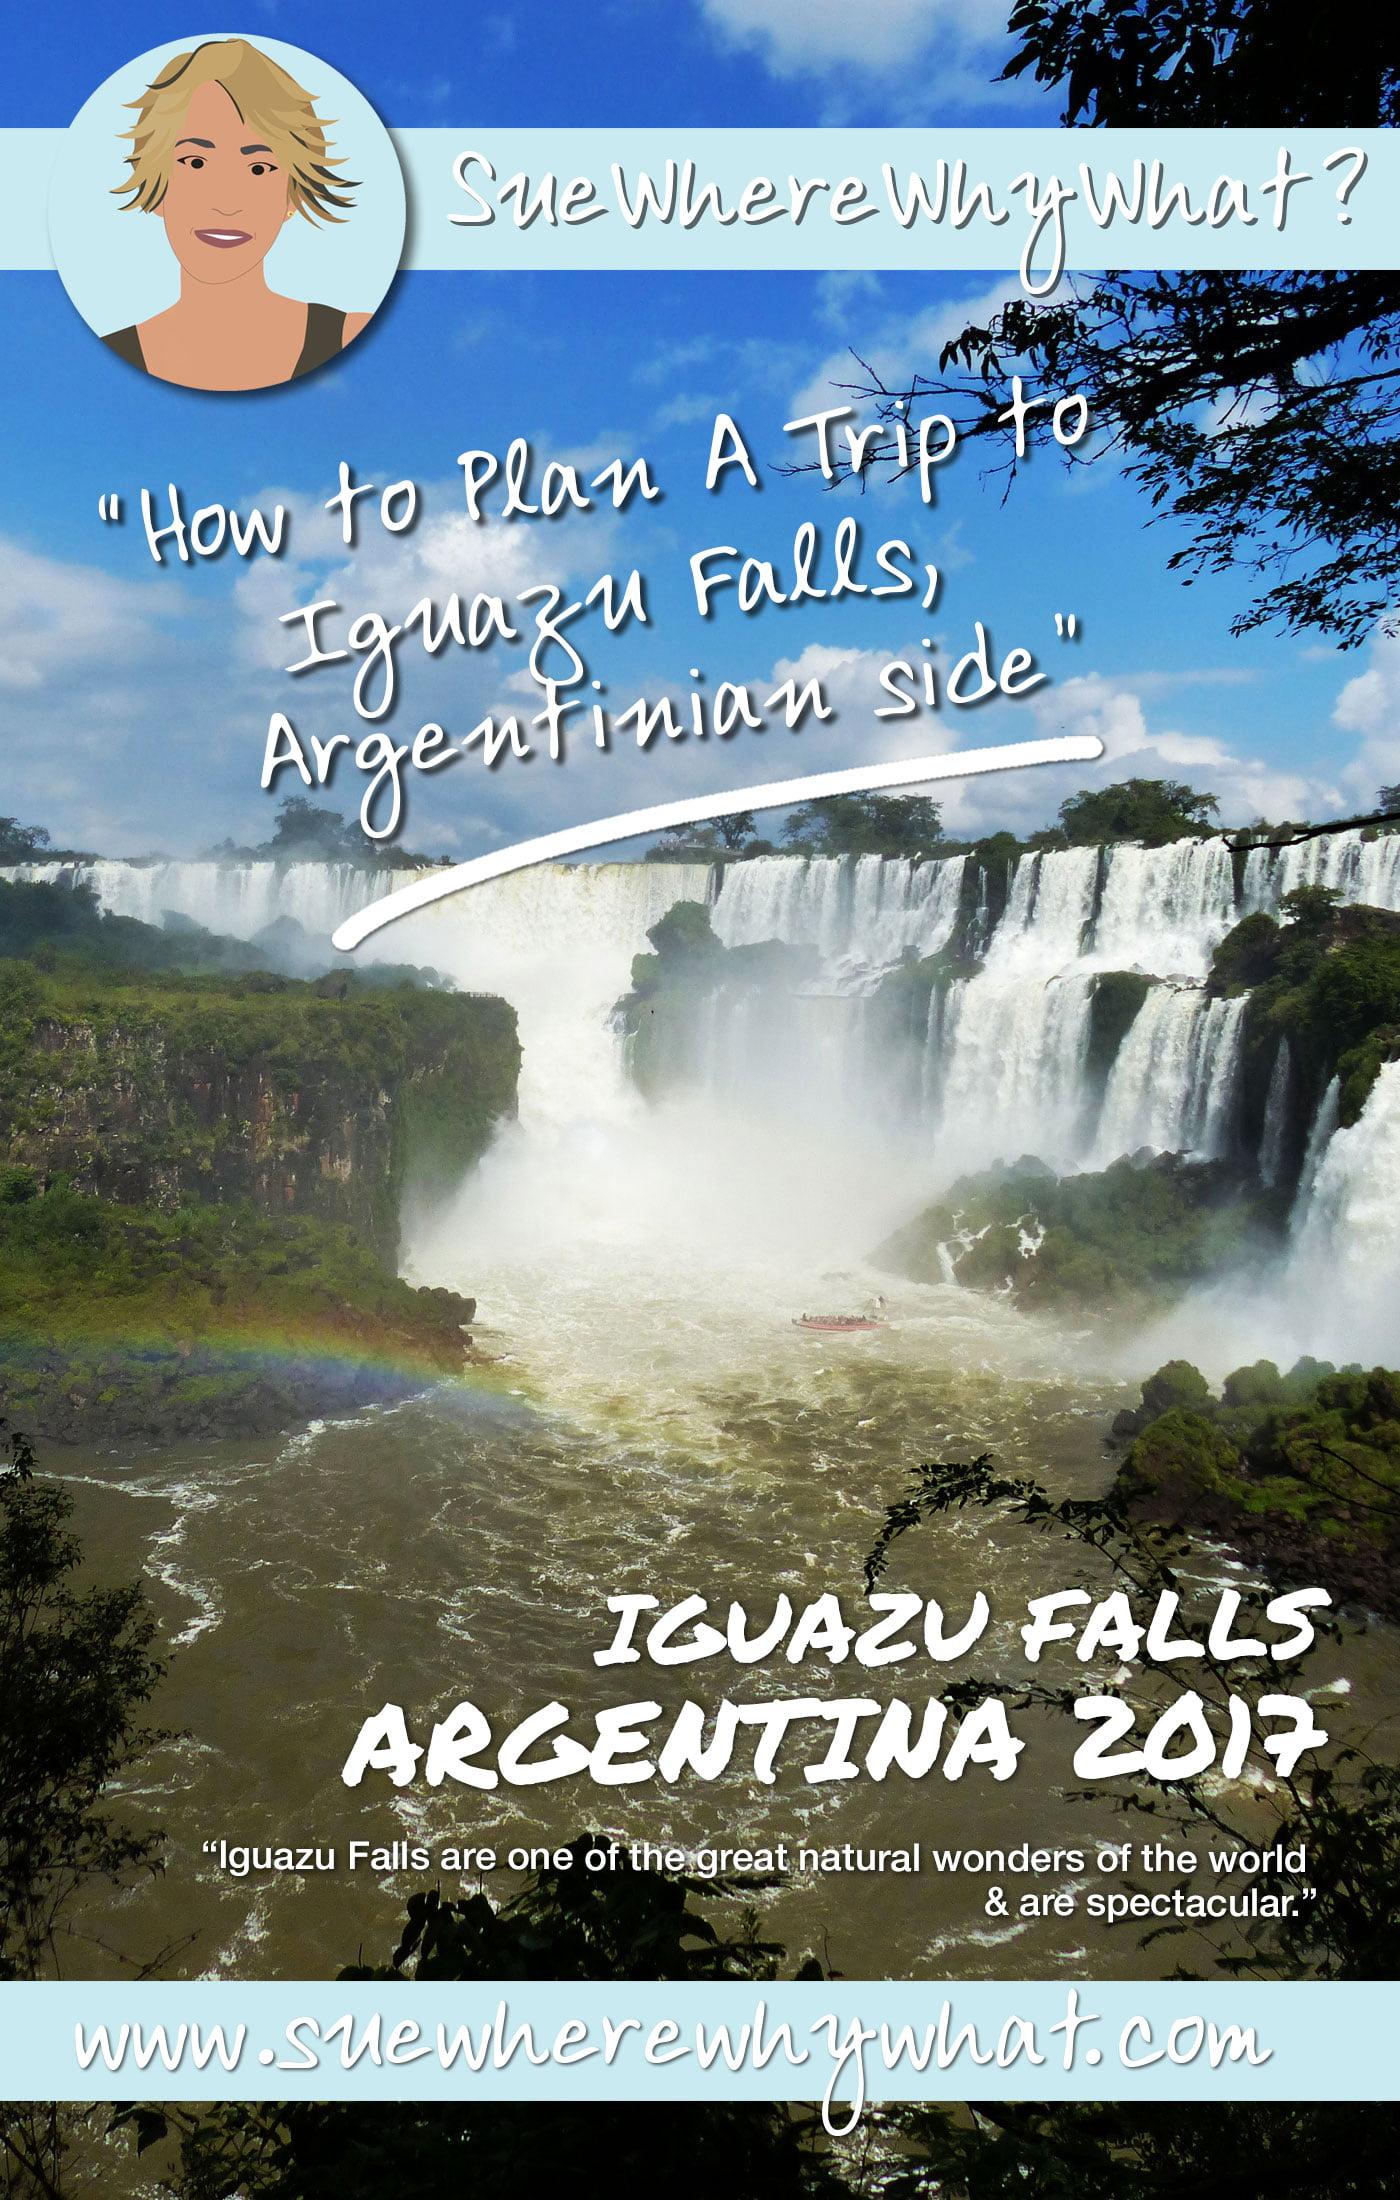 How to plan a trip to Iguazu Falls, Argentina